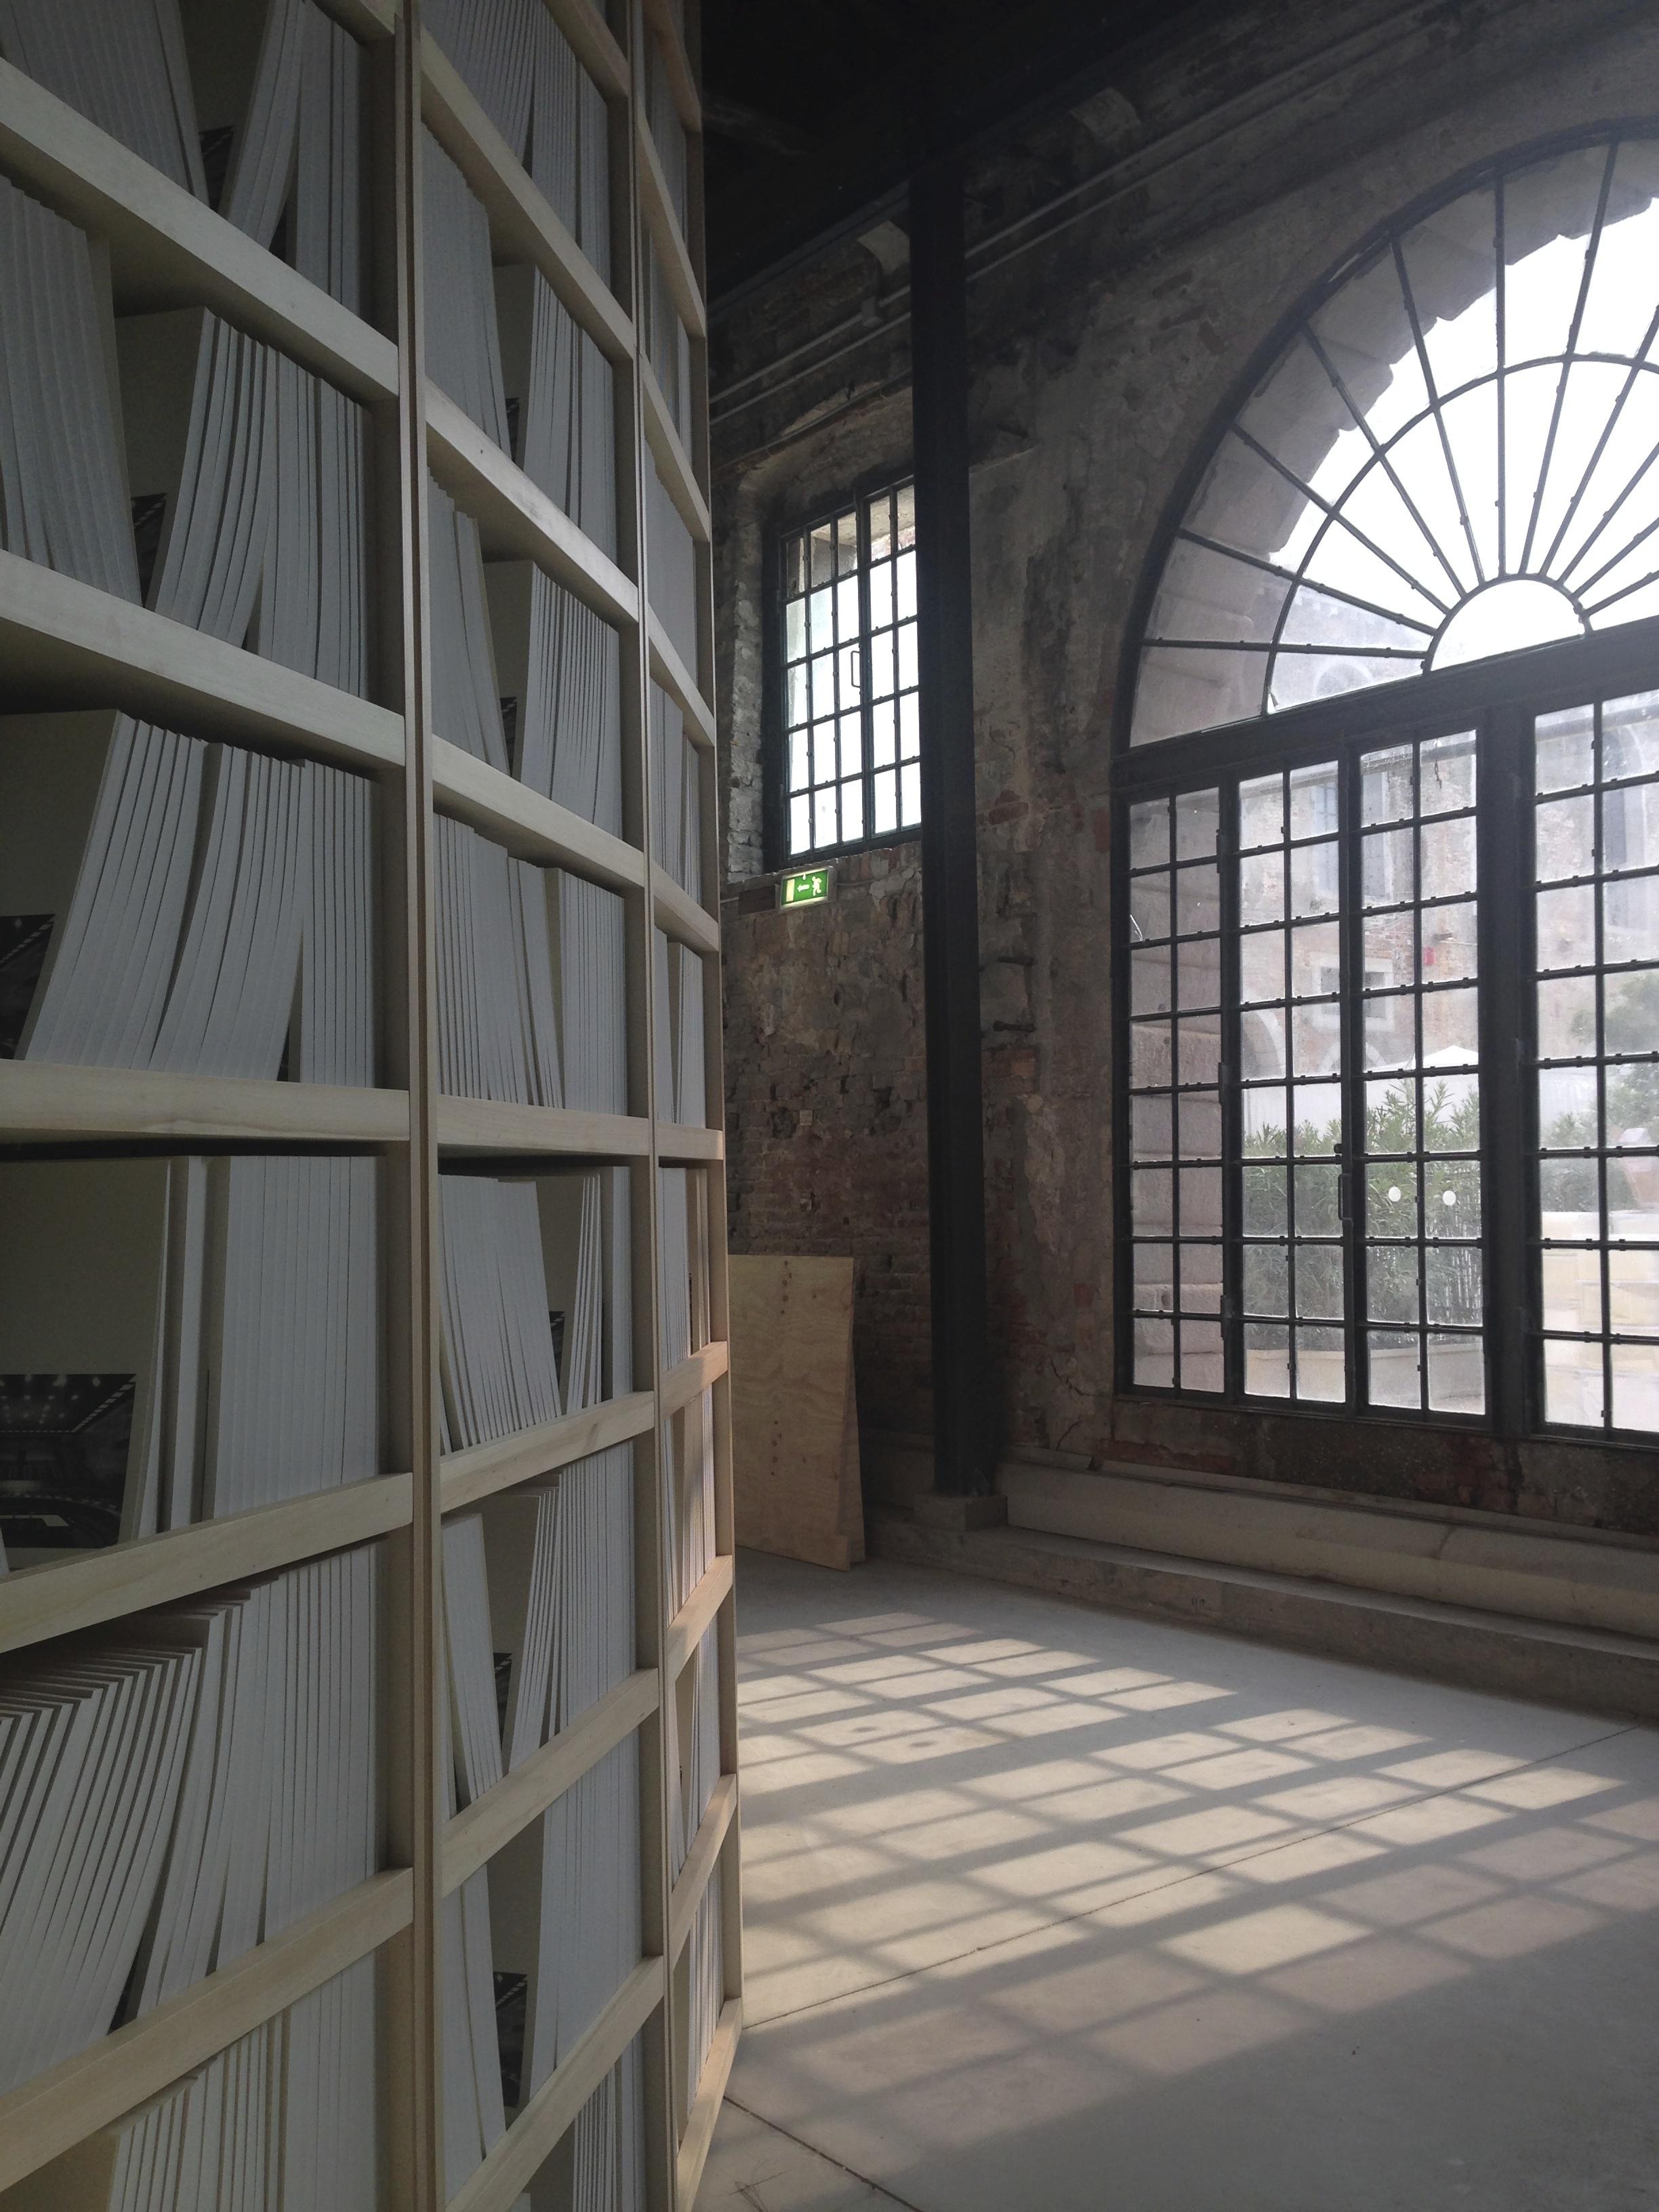 14th exhibition architecture - Venice Biennale 2014